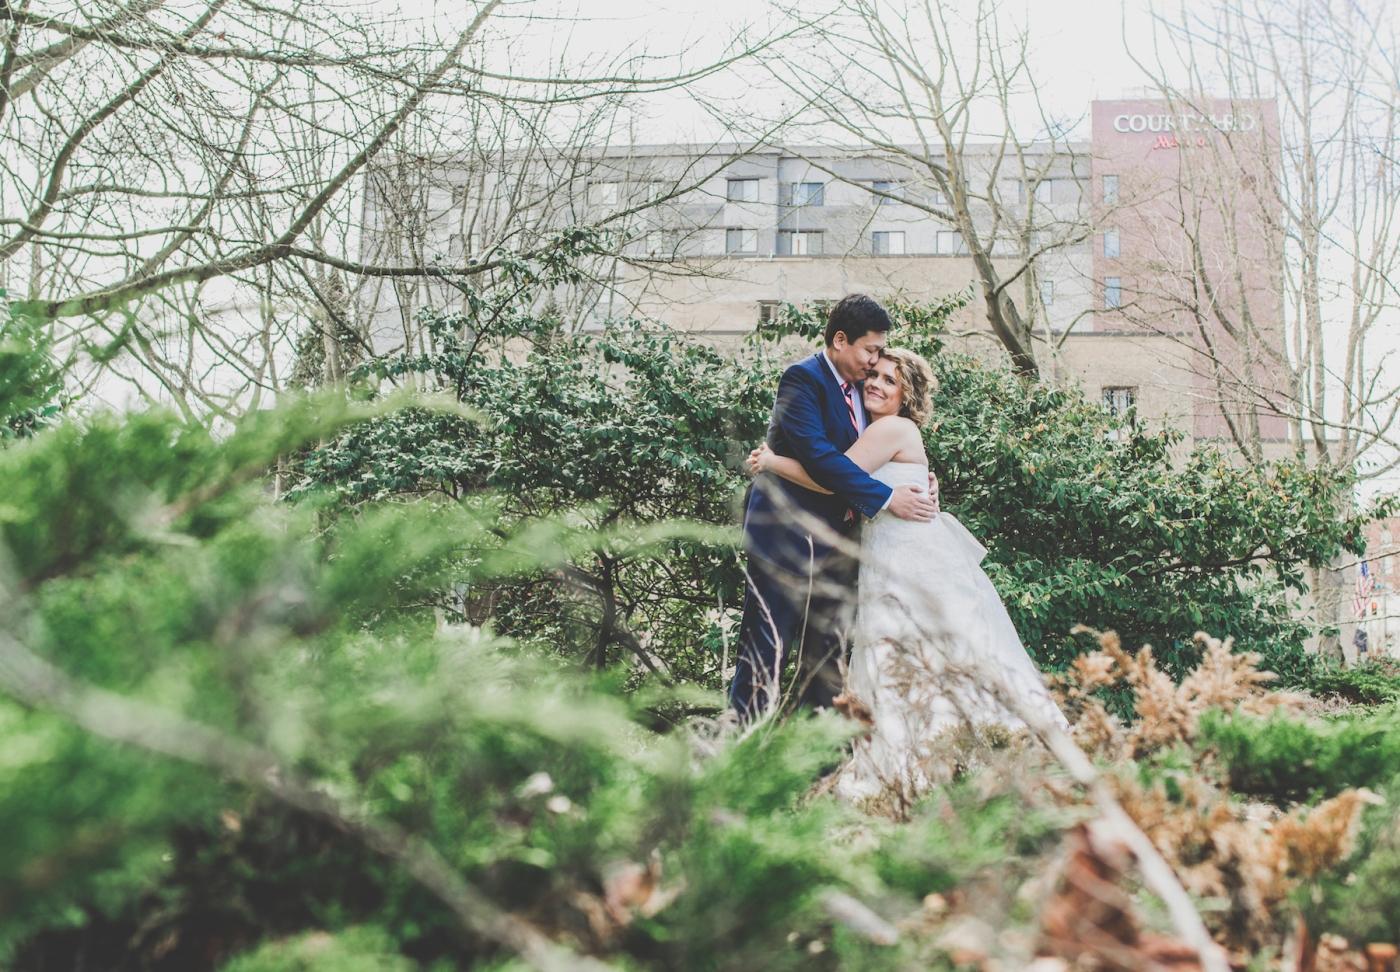 DSC_2315Everett_Wedding_Ballroom_Jane_Speleers_photography_Rachel_and_Edmund_Bridesmaids_peach_dresses_groomsmen_2017